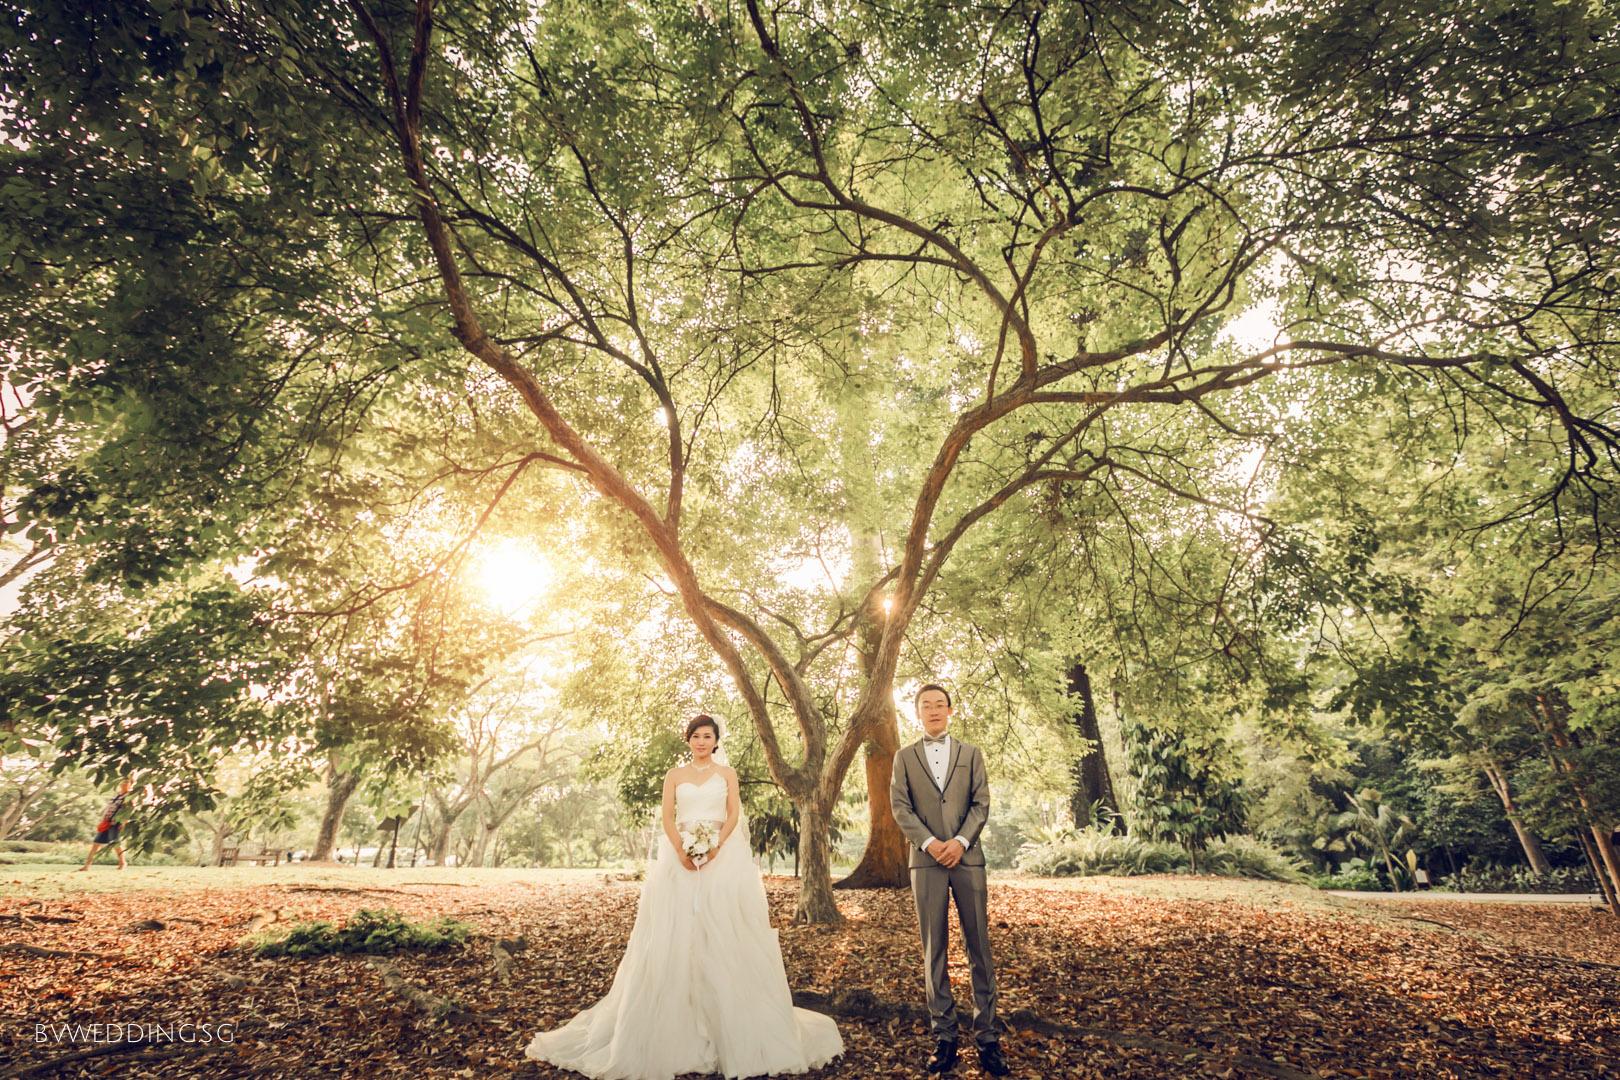 Pre-wedding Photoshoot at Botanic GardensPre-wedding Photoshoot at Botanic Gardens